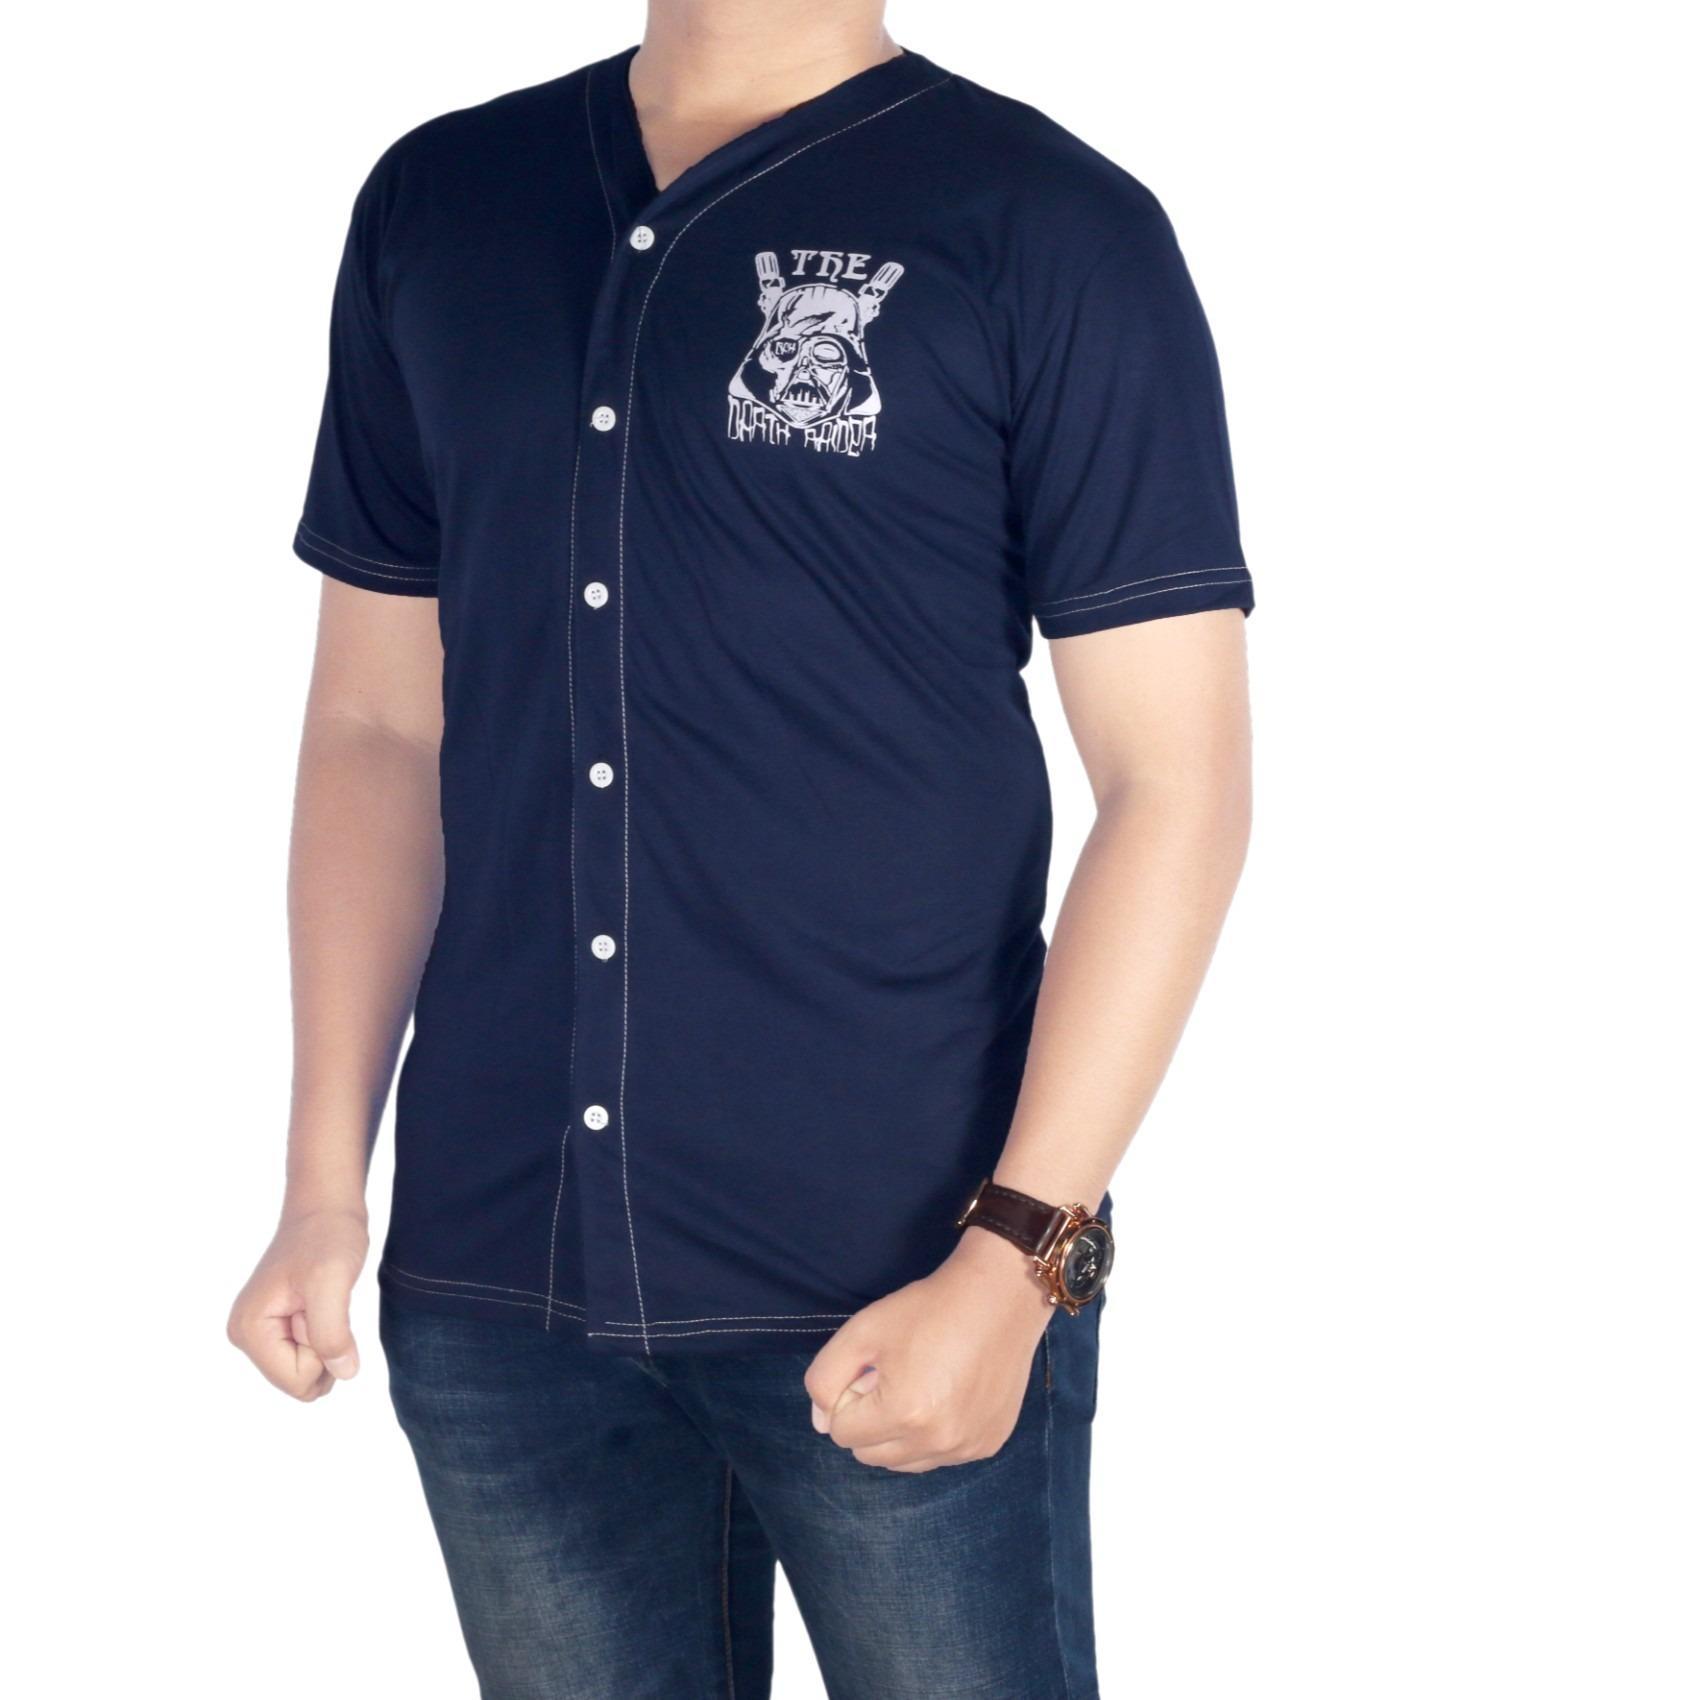 Spesifikasi Dgm Fashion1 Baju Kaos Baseball Starwash Kaos Hitam Pria Kaos Men T Shirt Man Kaos Polos Kaos Distro Kaos Casual Kaos Polo Kaos Combet Baju Kaos Pria Kaos Young Lex Kaos Long Line Kaos Baseball 5429 Navy Dan Harganya